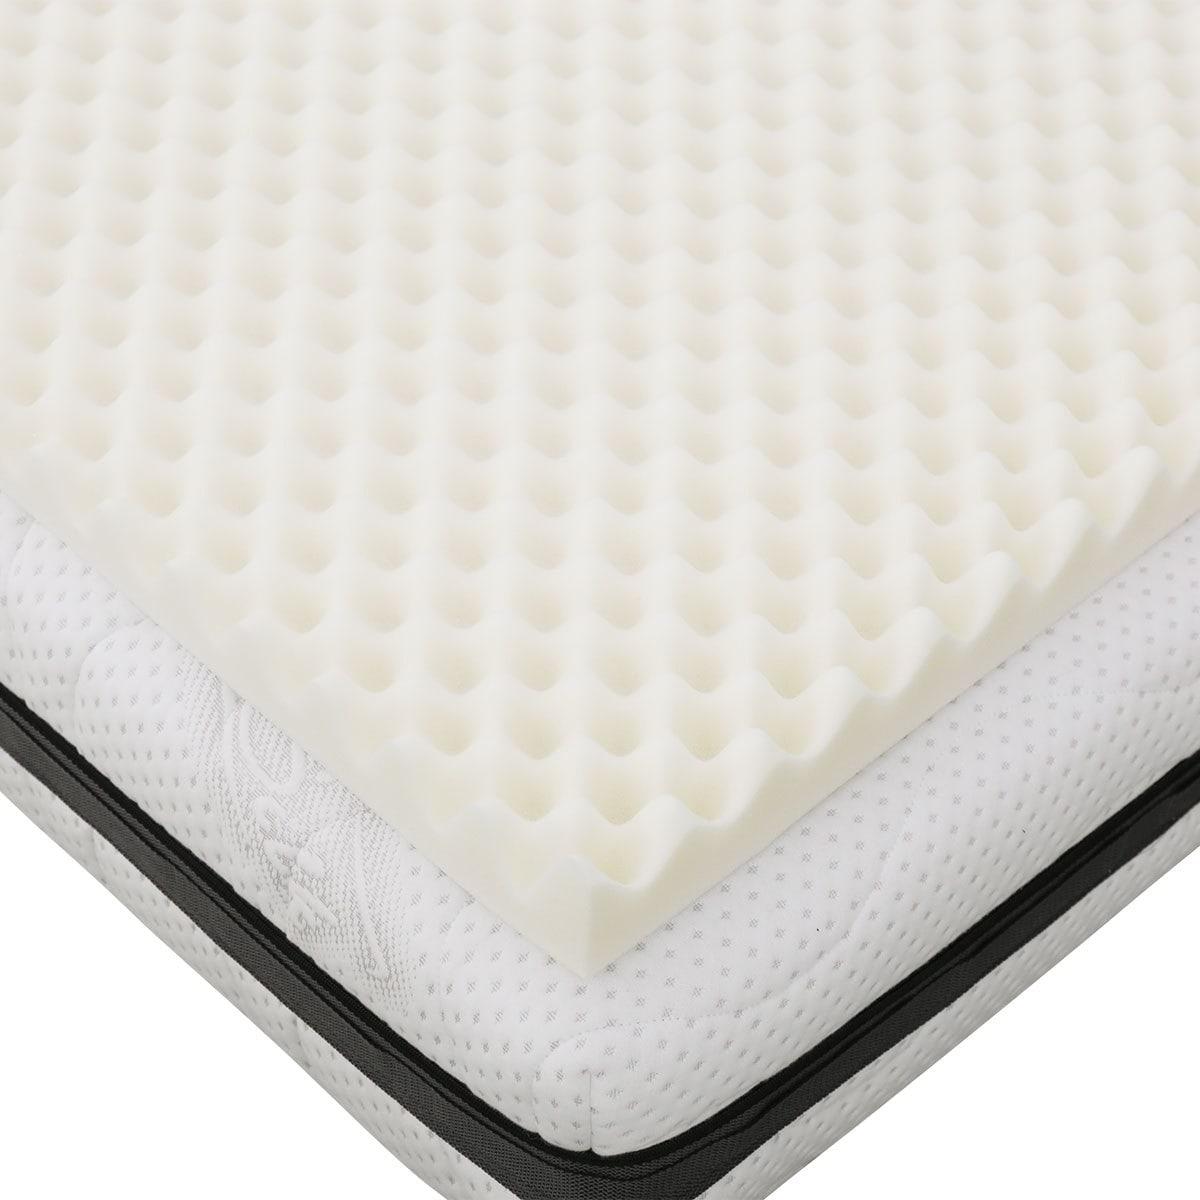 traumschlaf visco topper matratzentopper microaktiv g nstig online kaufen bei bettwaren shop. Black Bedroom Furniture Sets. Home Design Ideas